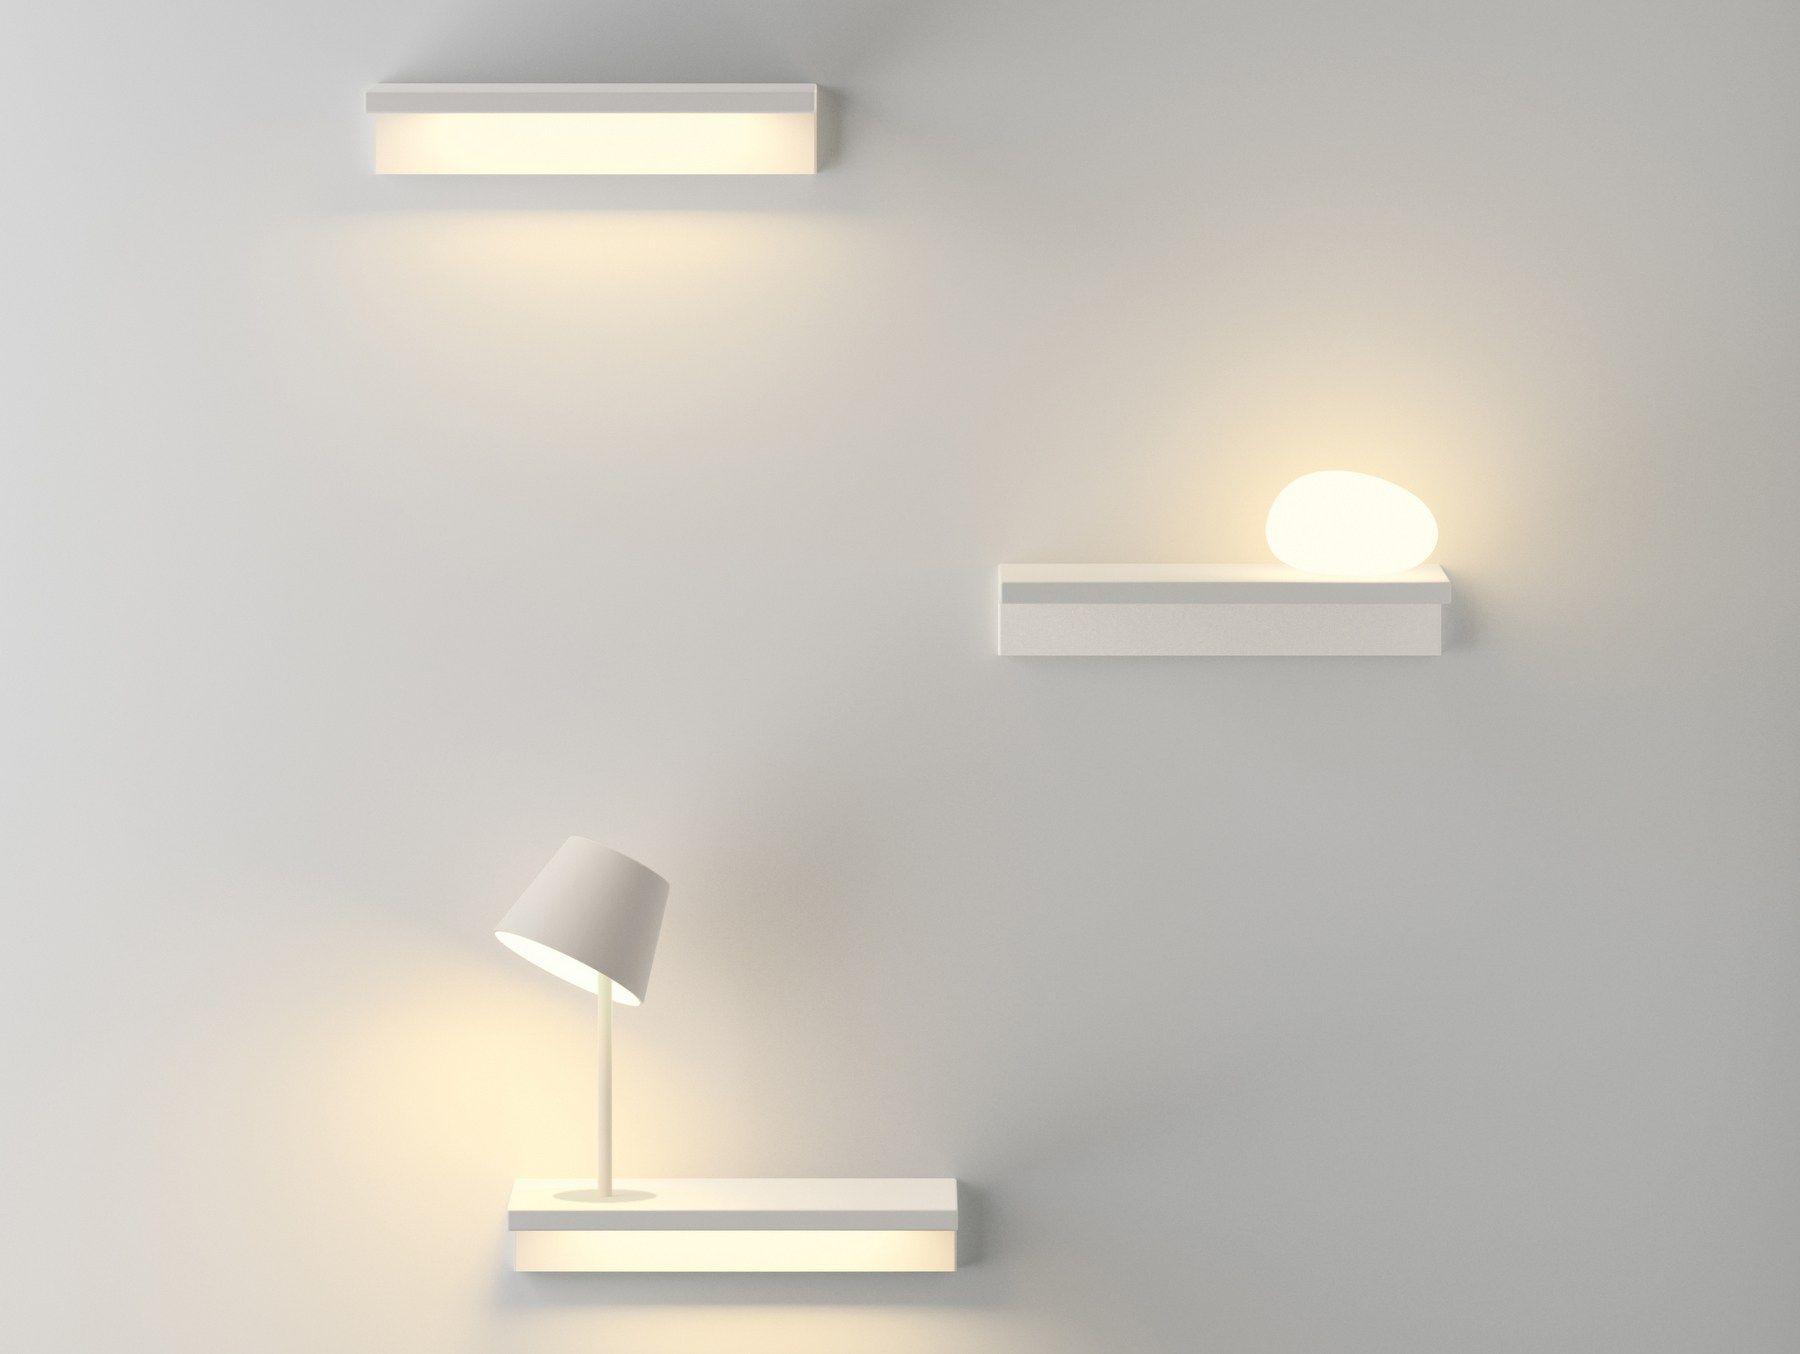 lampadari tiffany prezzi : Tiffany Originali Prezzi : Lampade Cucina Design: Lampade e lampadari ...